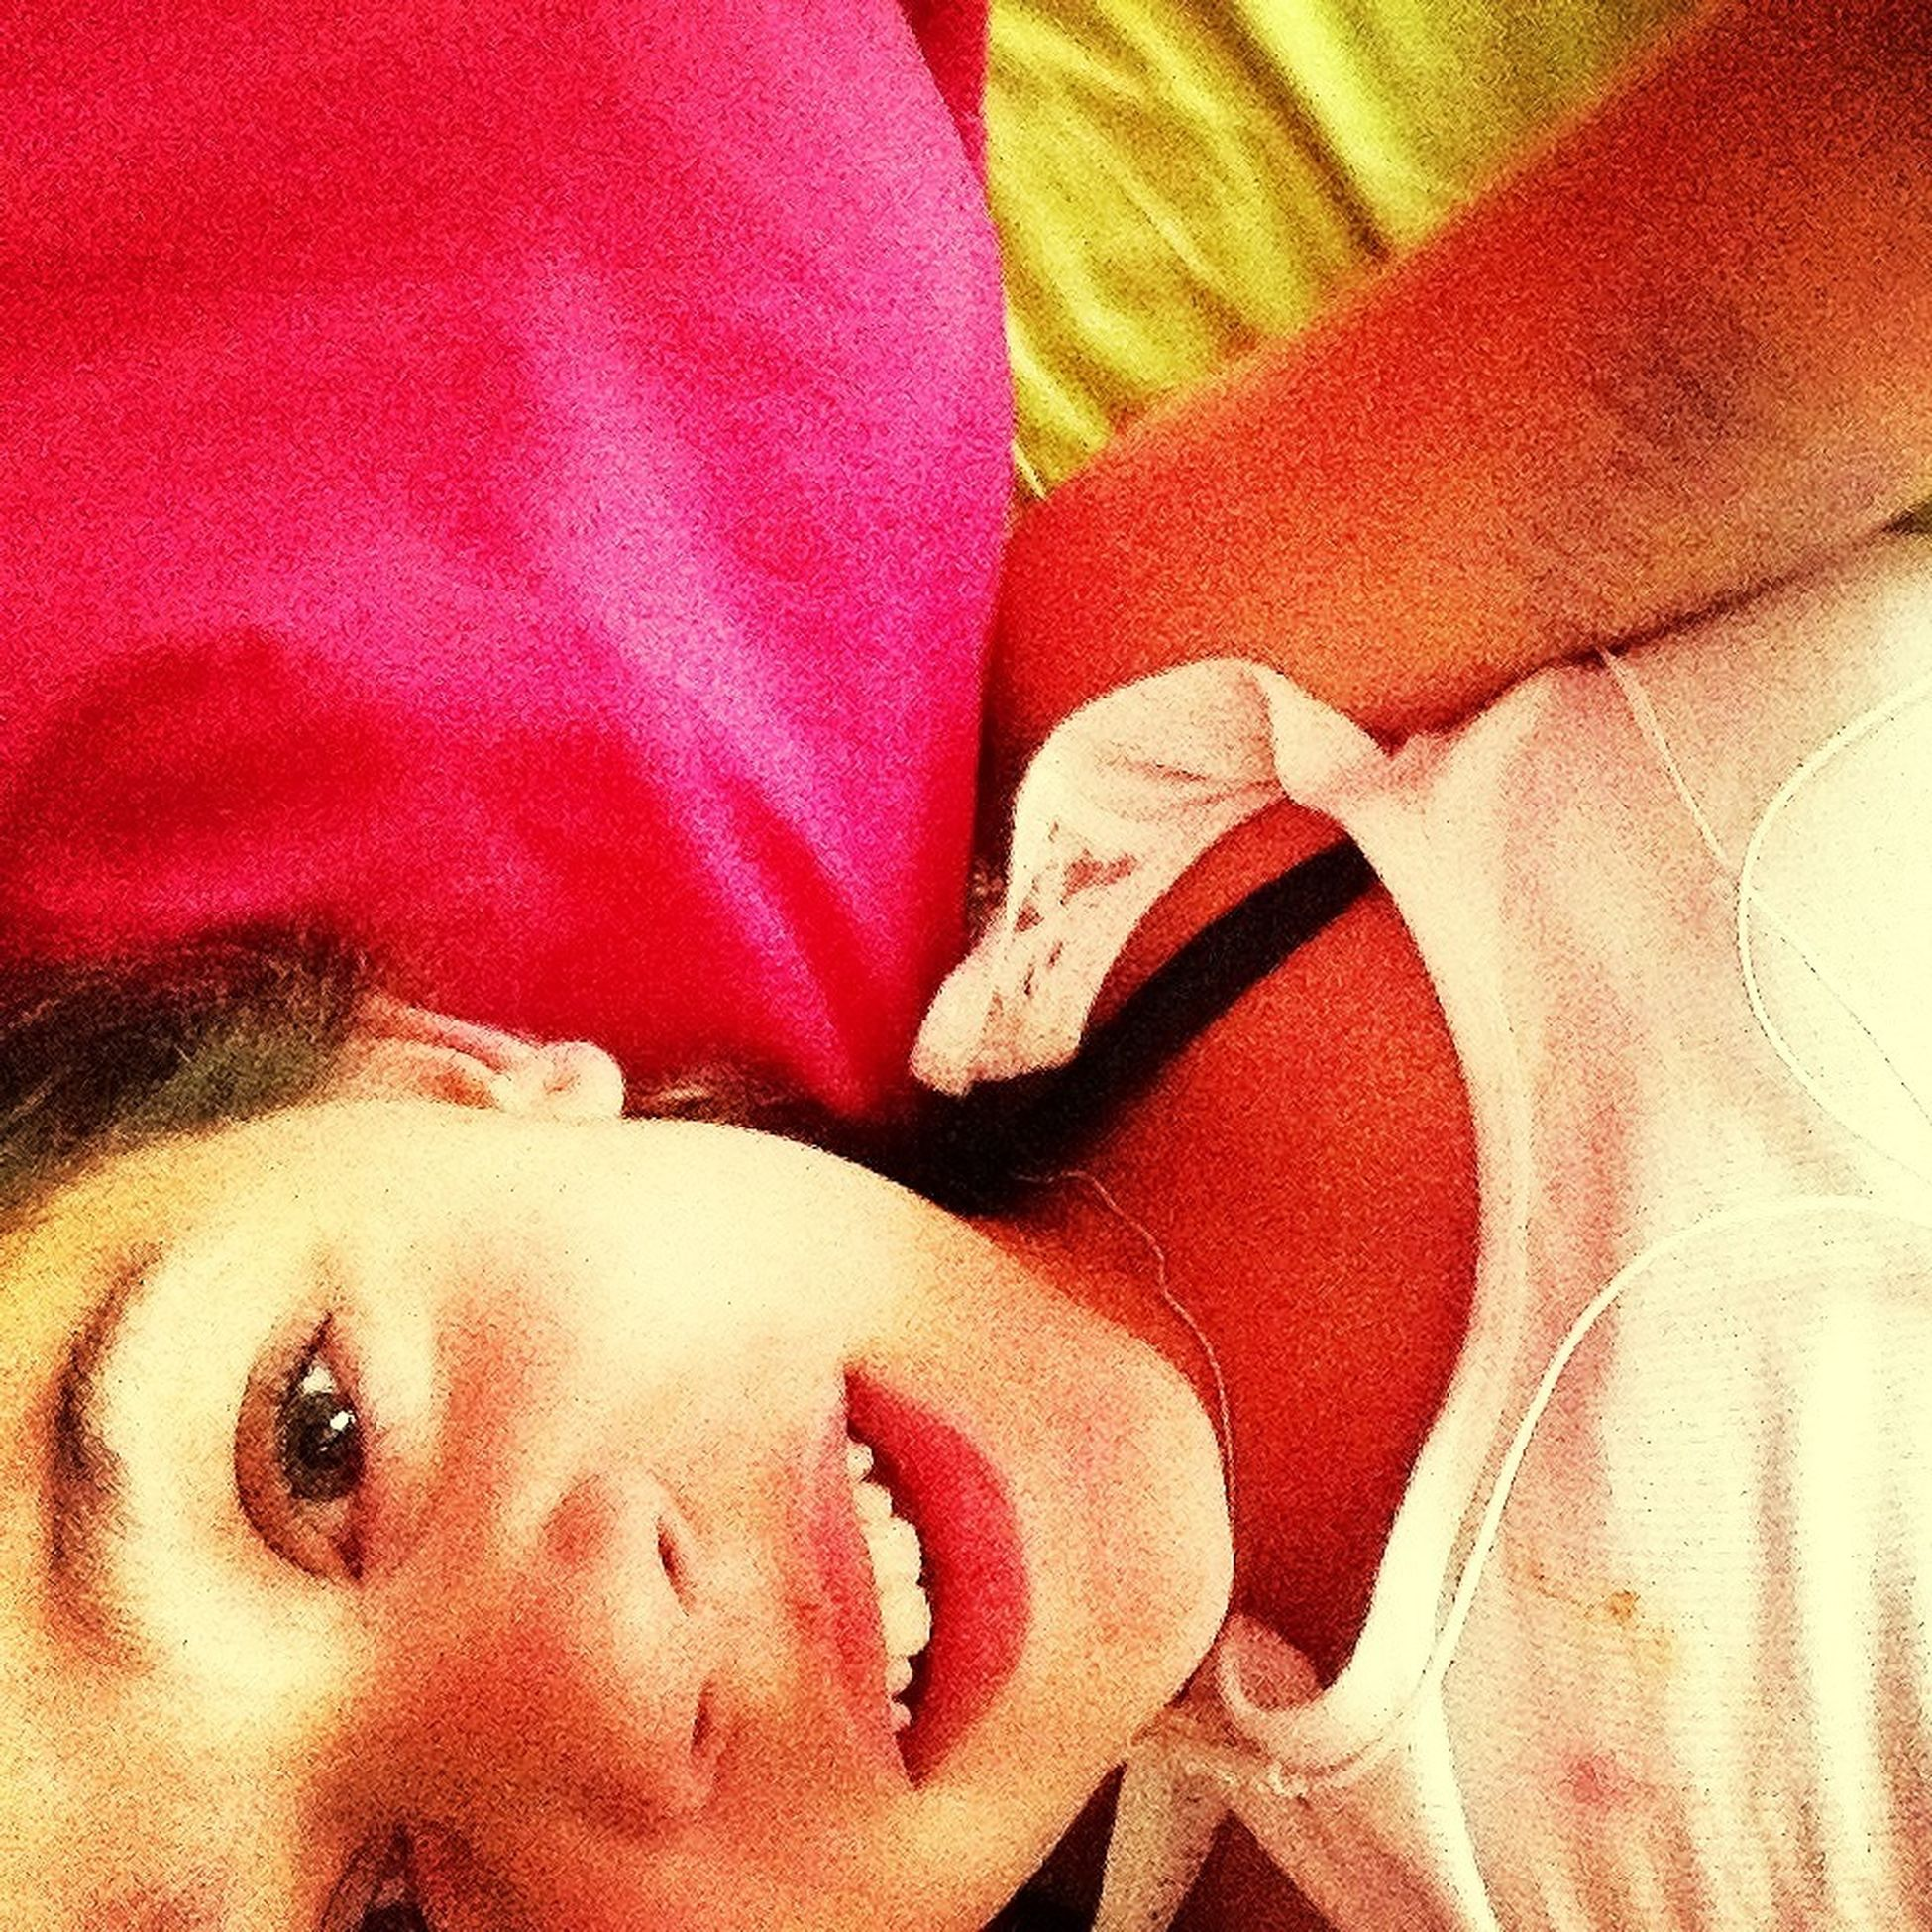 good morning my lovelies ;* Justwokeup Gonnaseehimtoday Lookinbad Ew